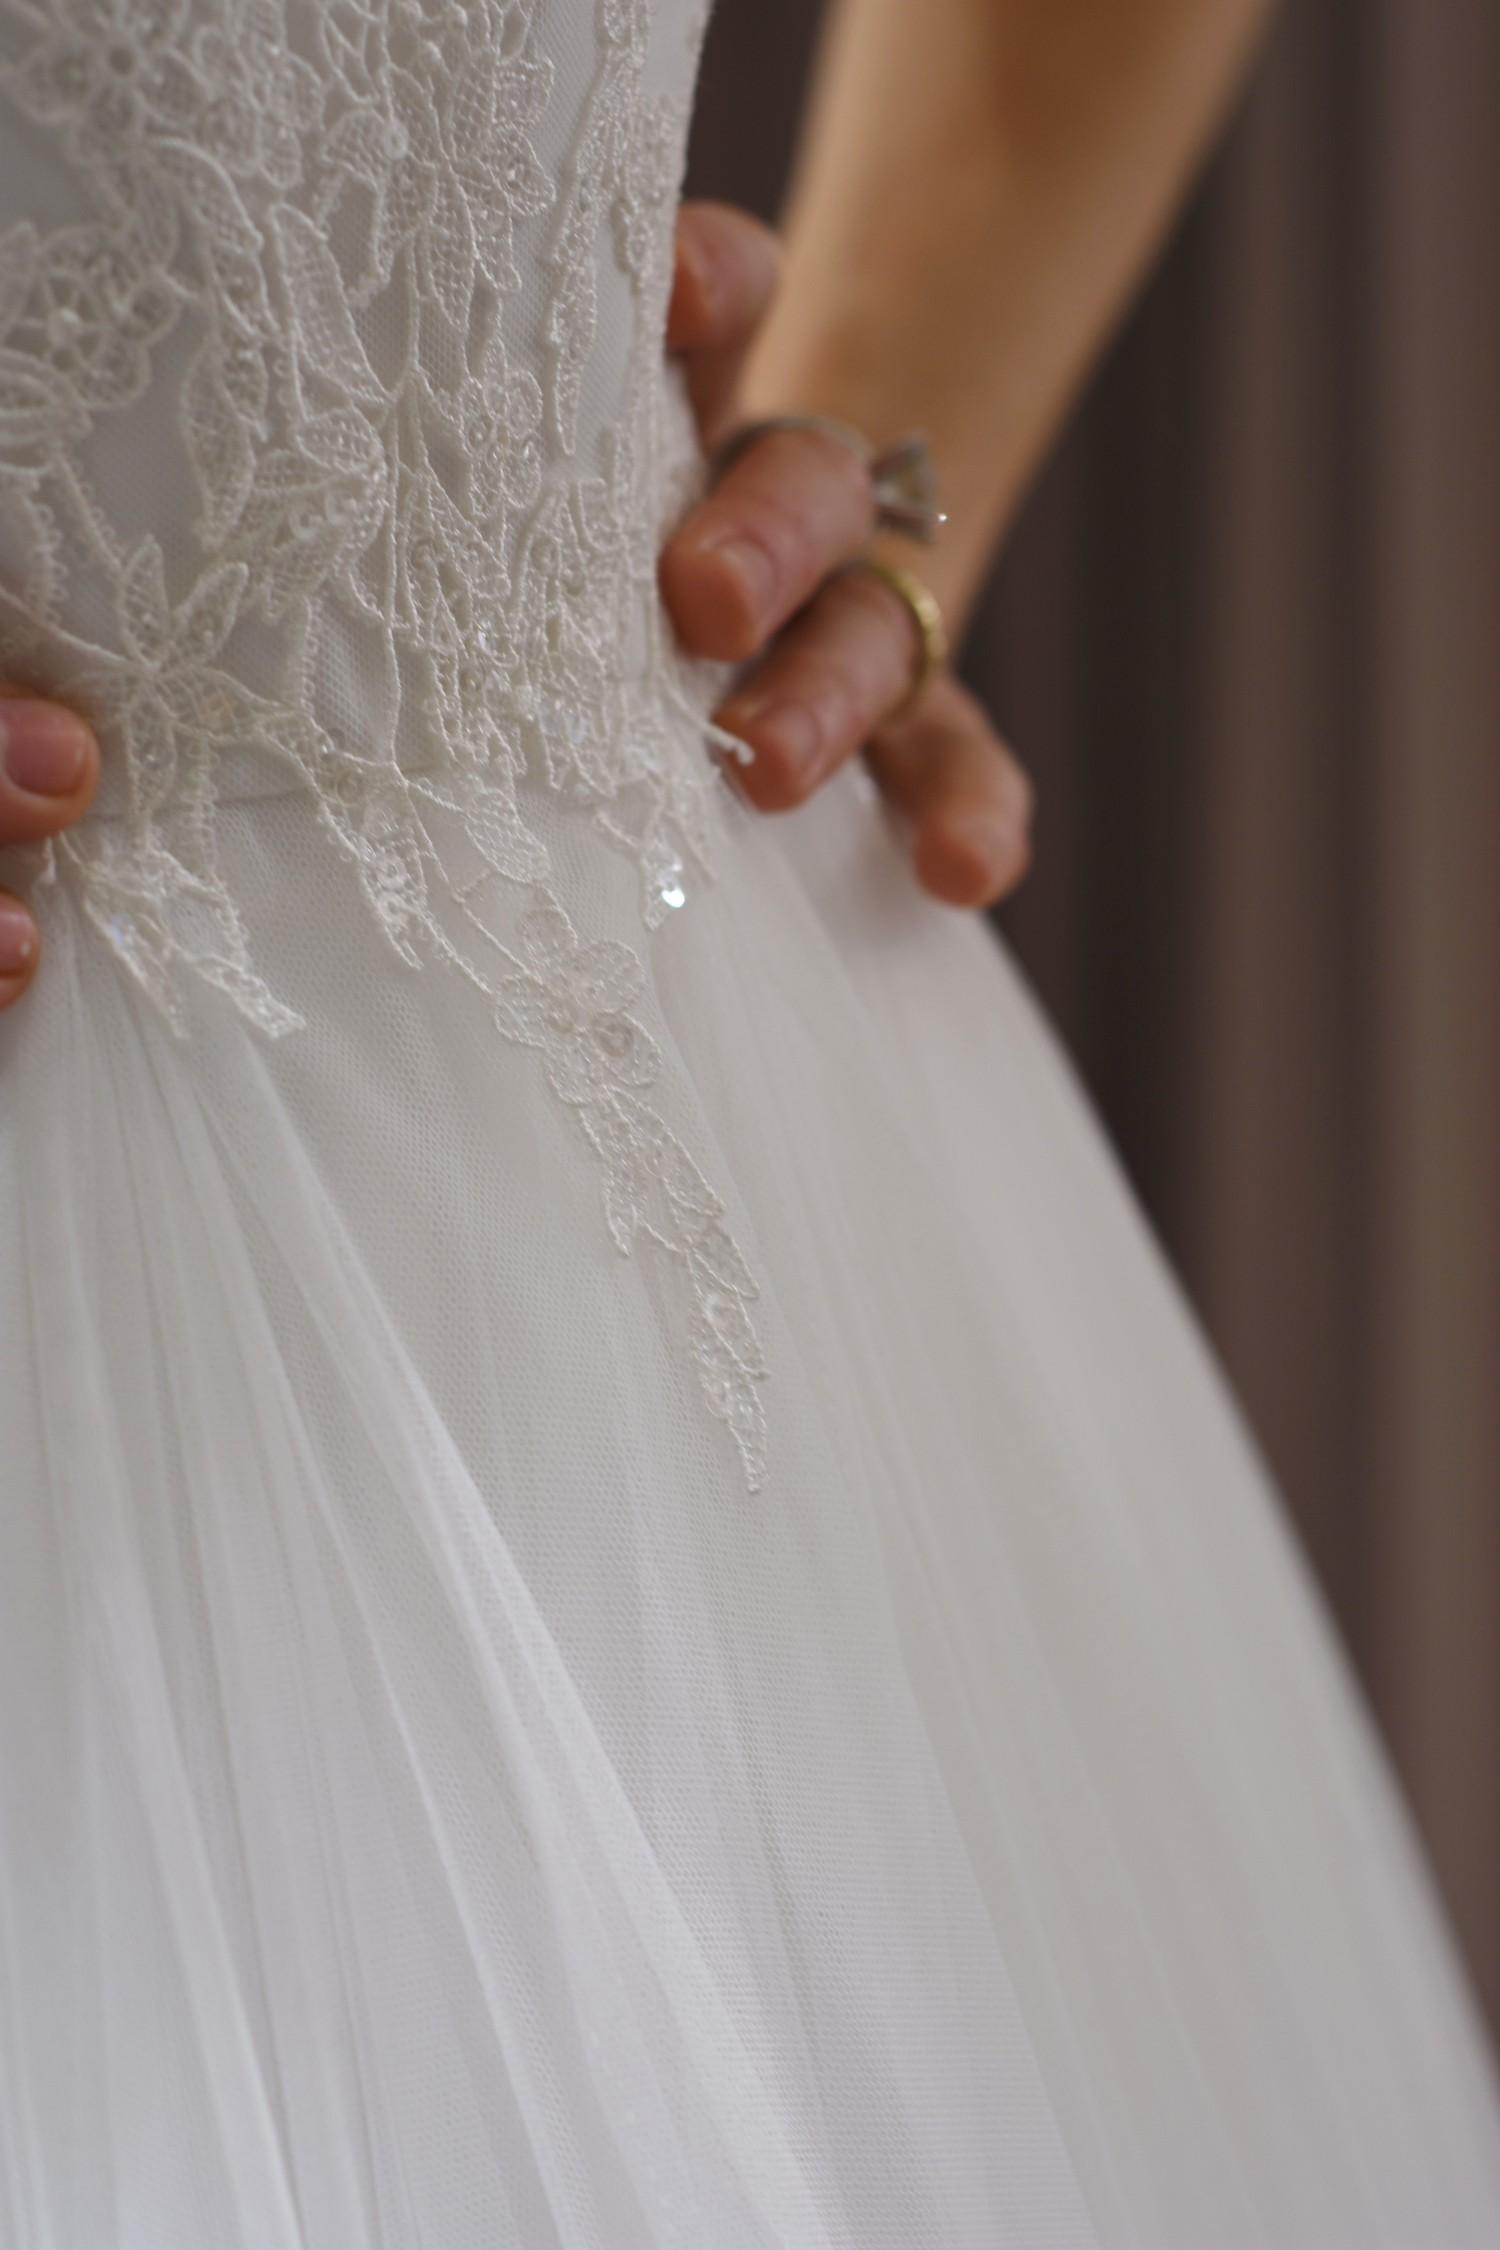 lilly-brudekjoler-annemette-voss-26